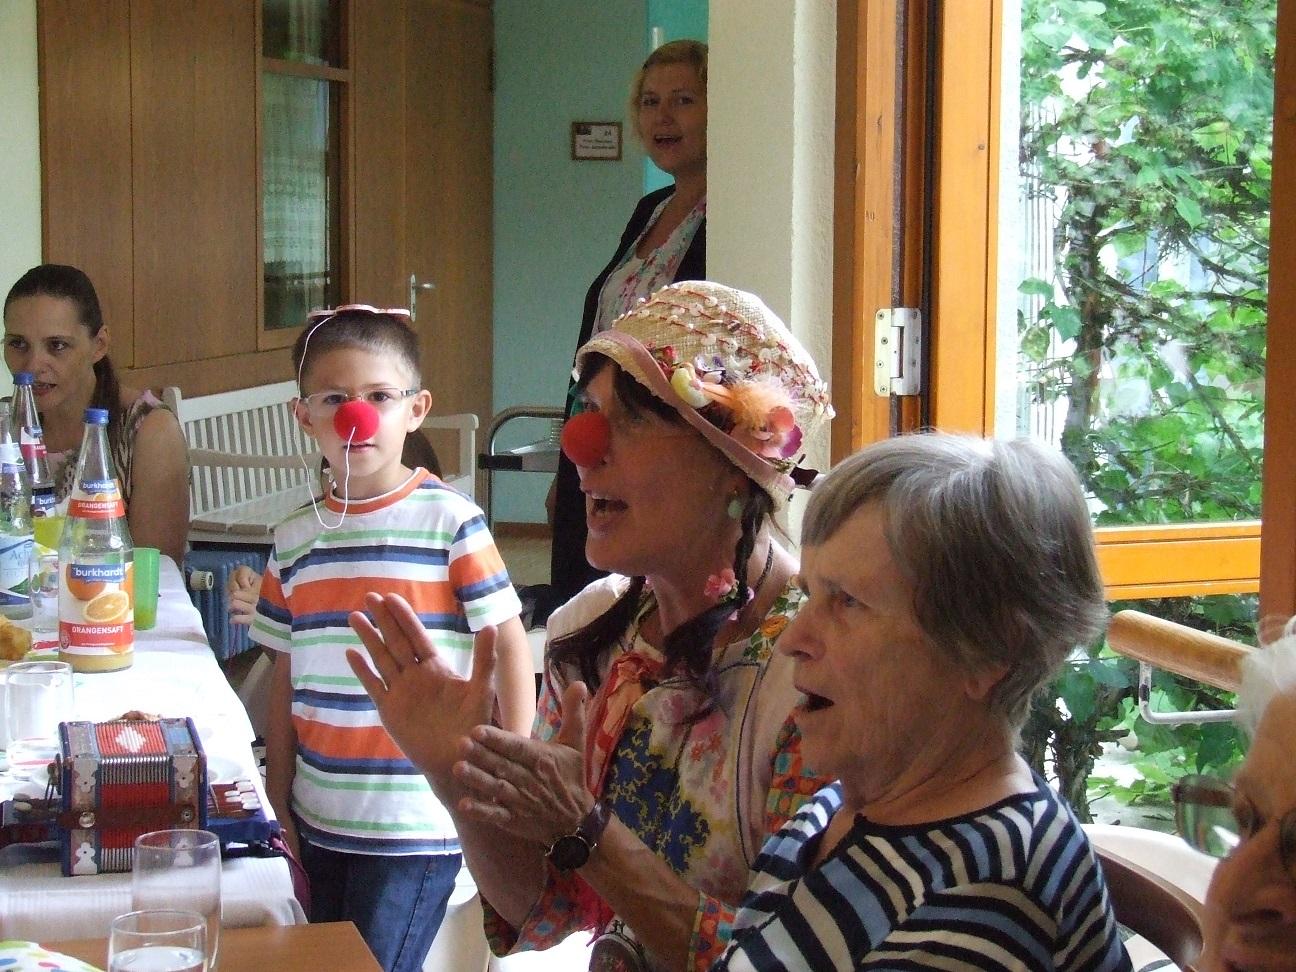 Sommerfest Humor verbindet Generationen